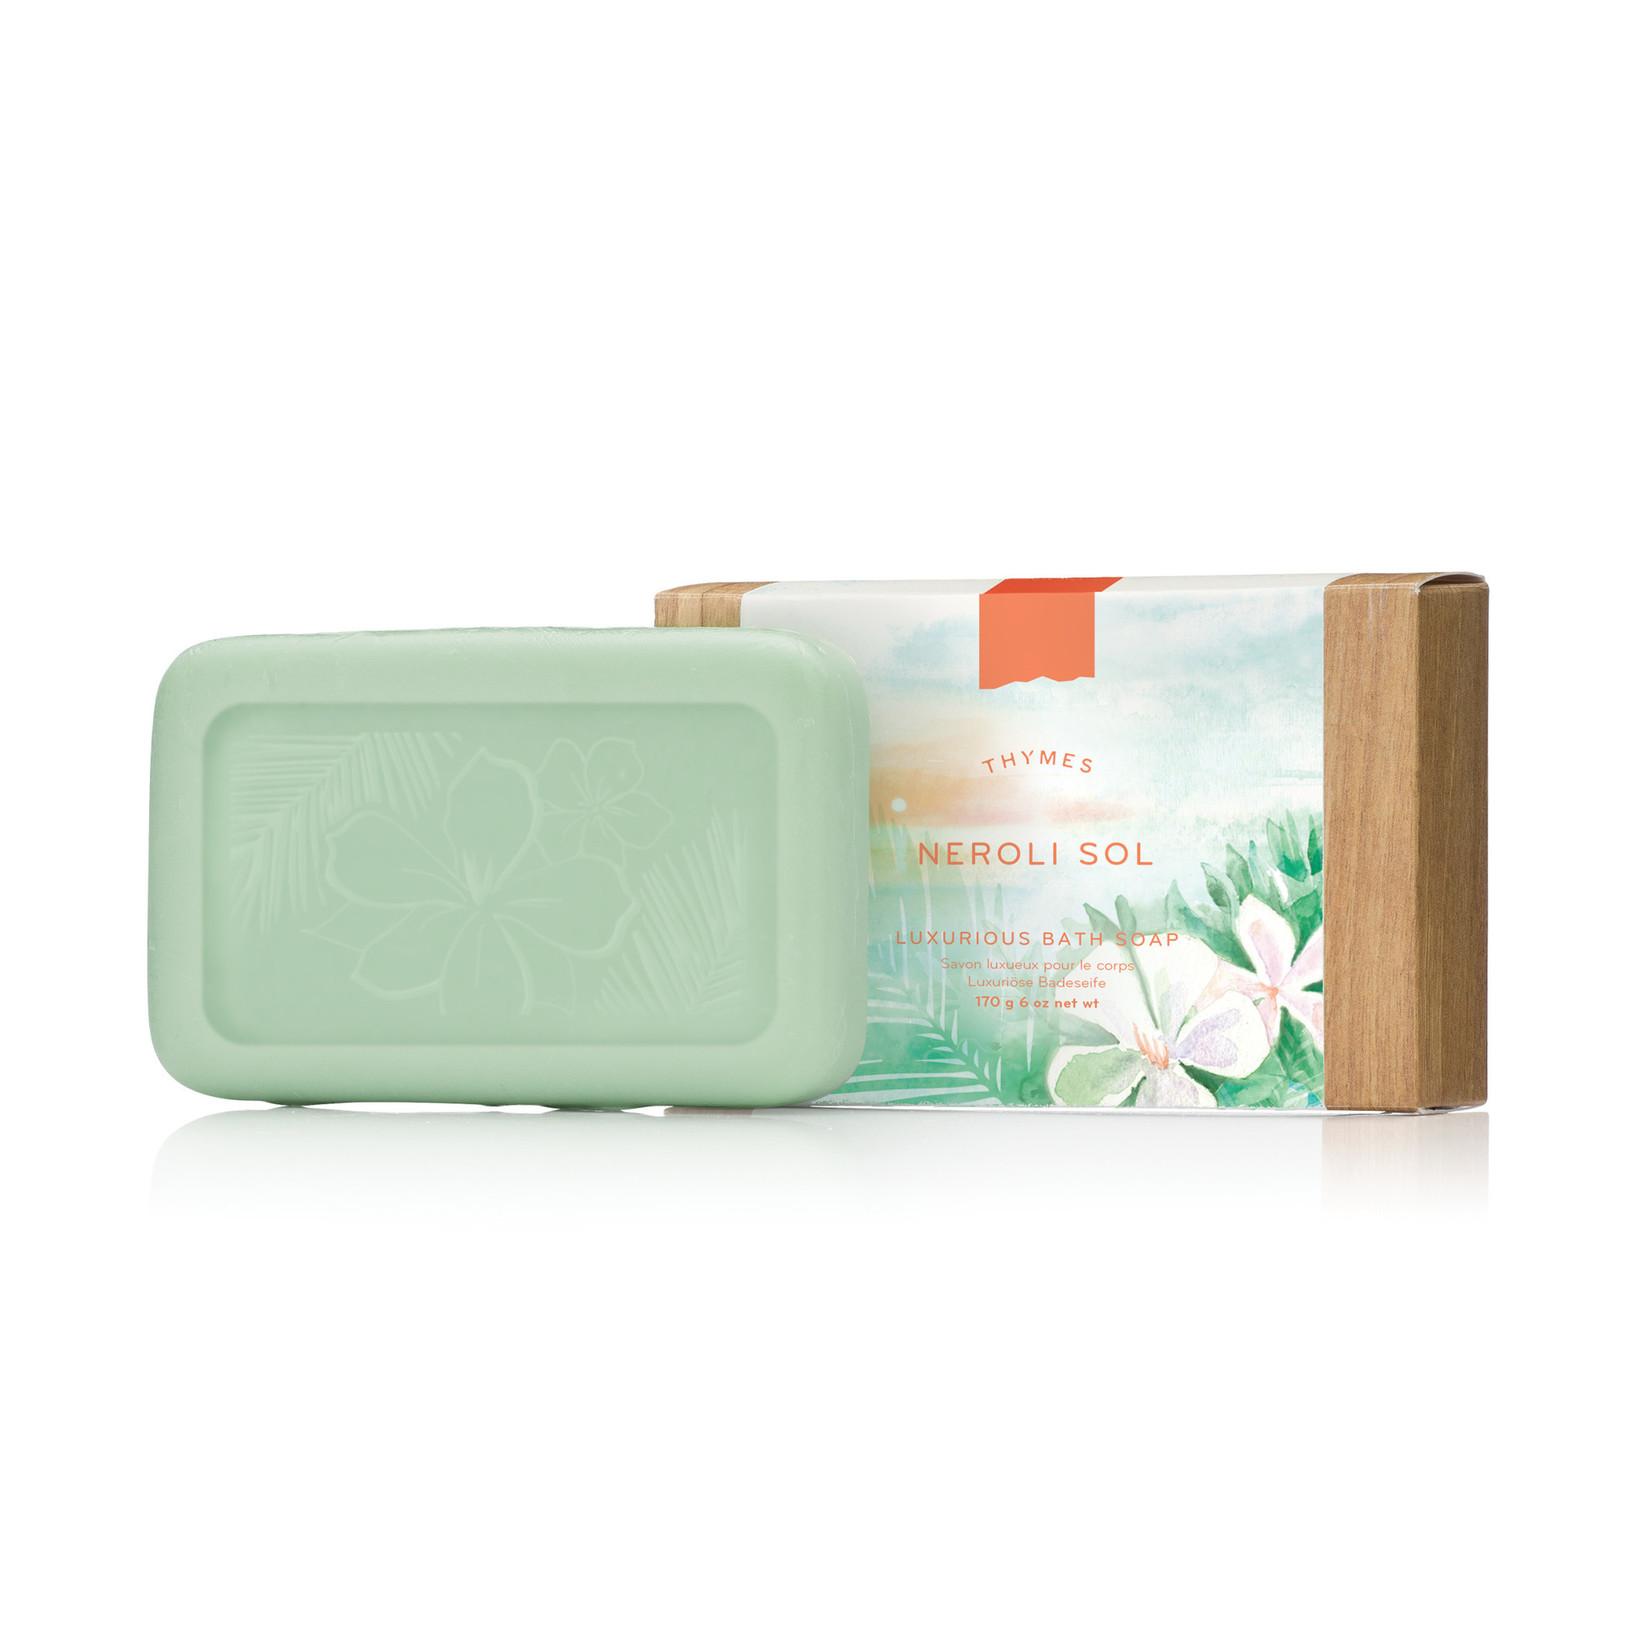 Neroli Sol Bath Soap